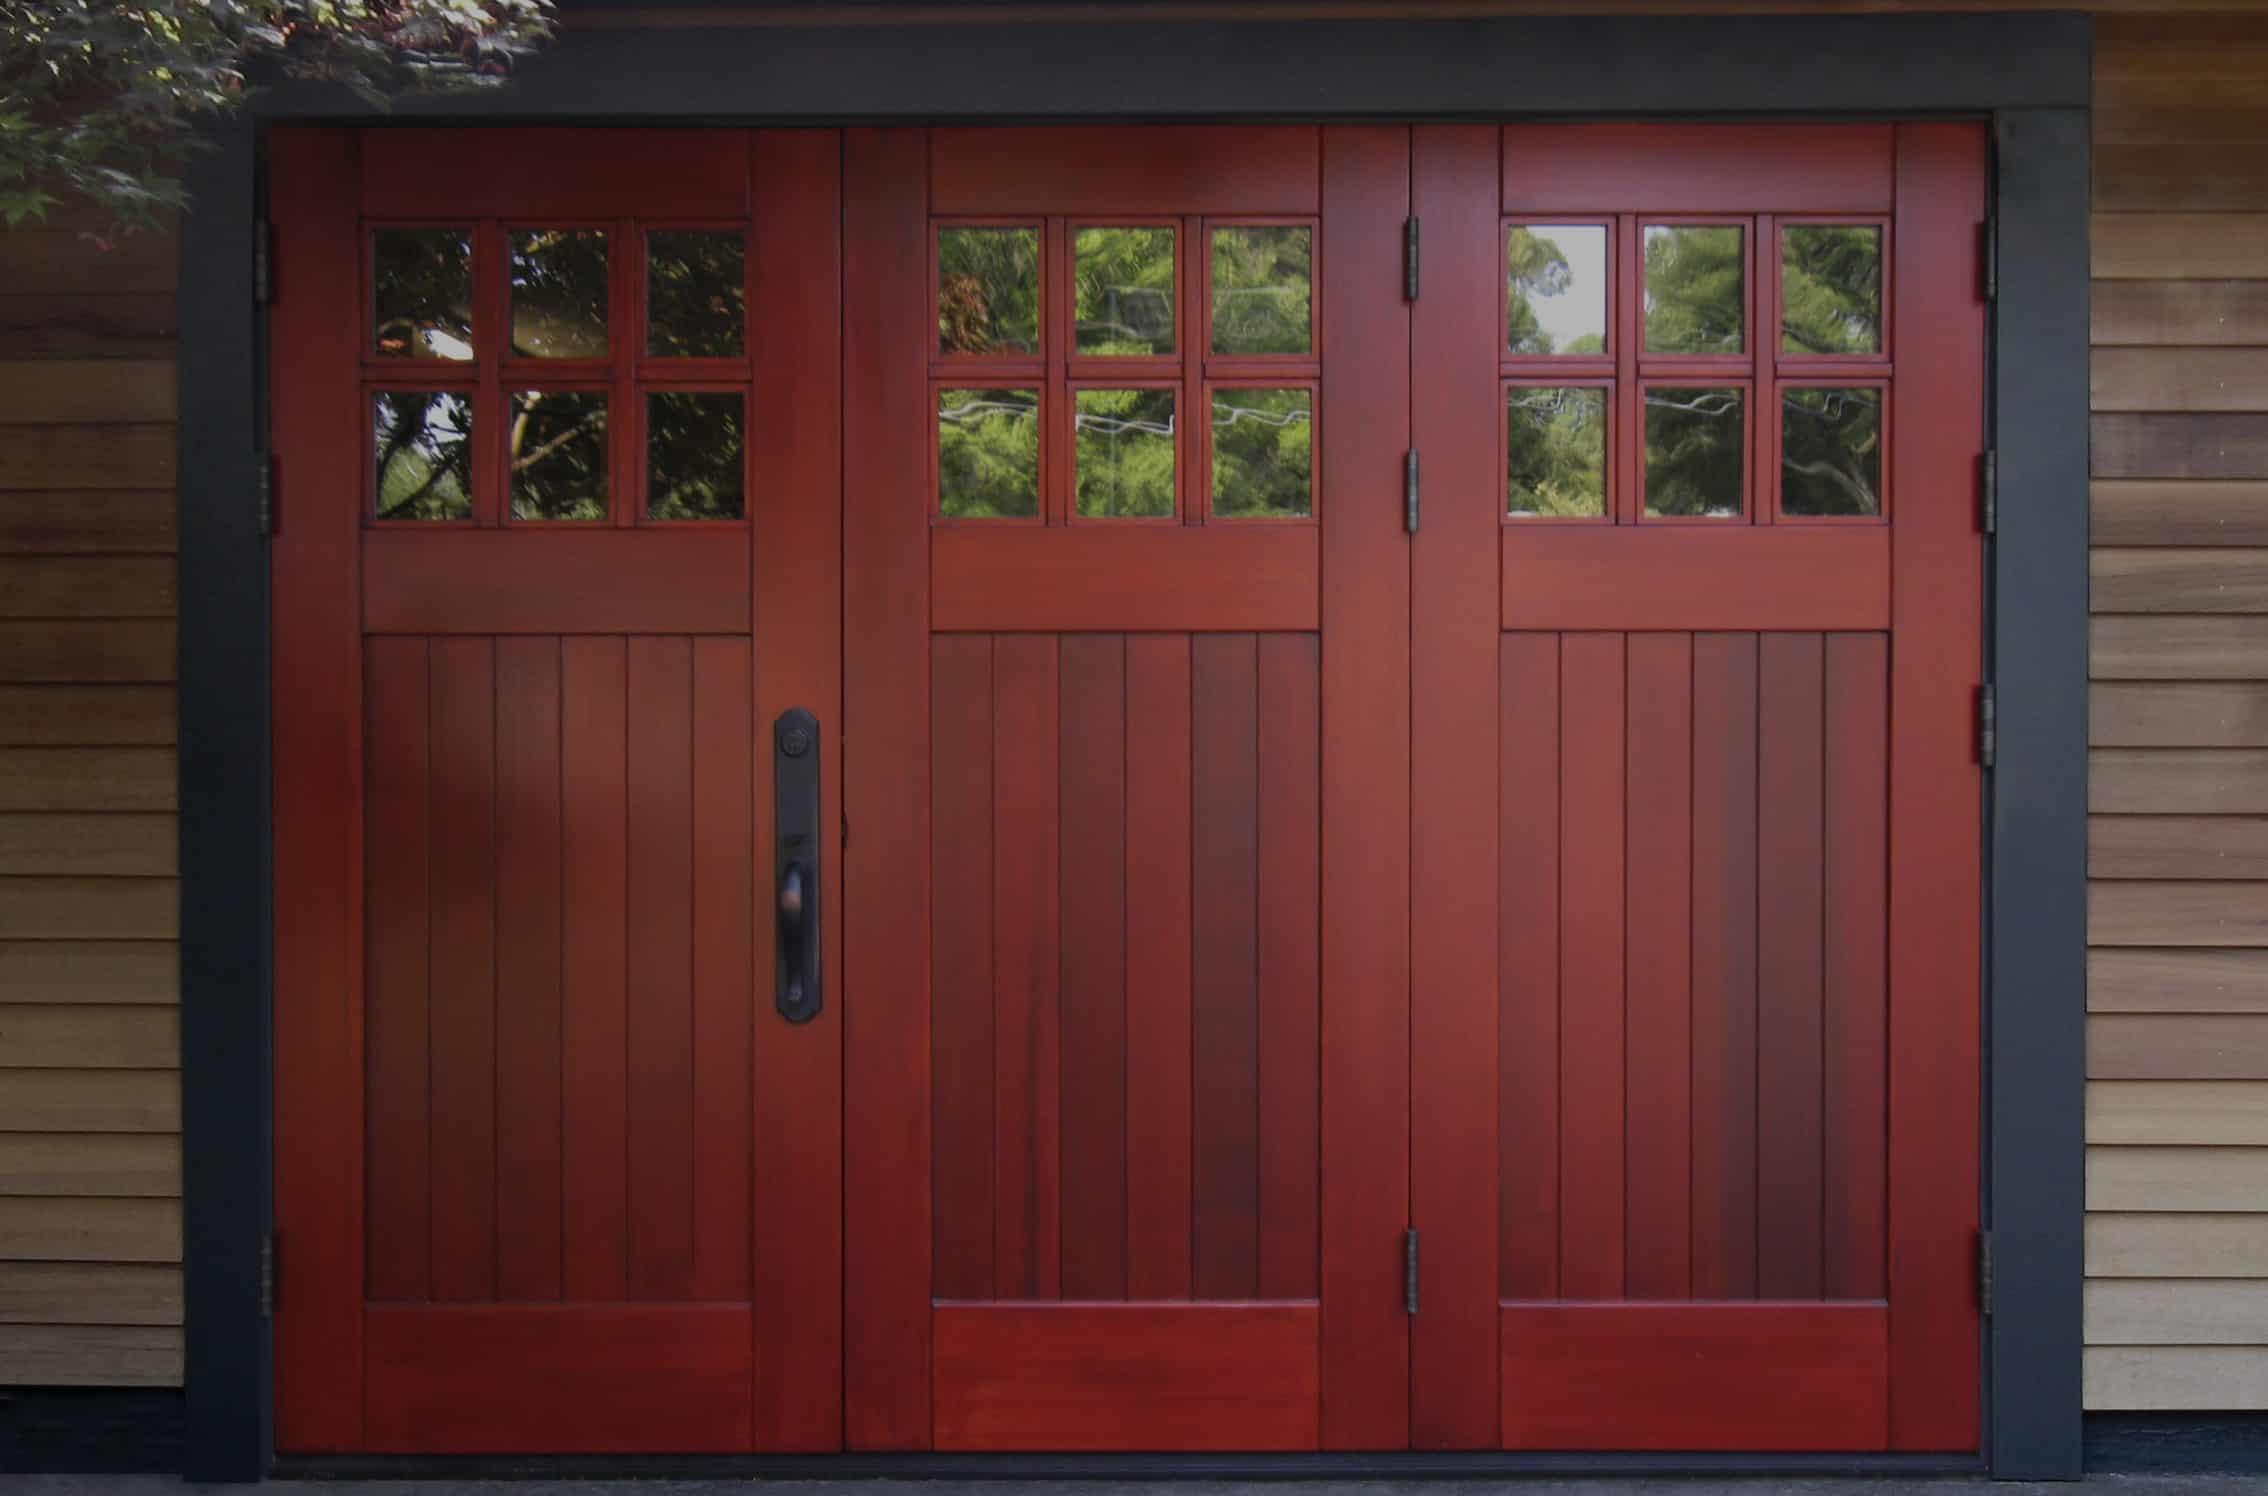 3-panel wood folding doors for the garage